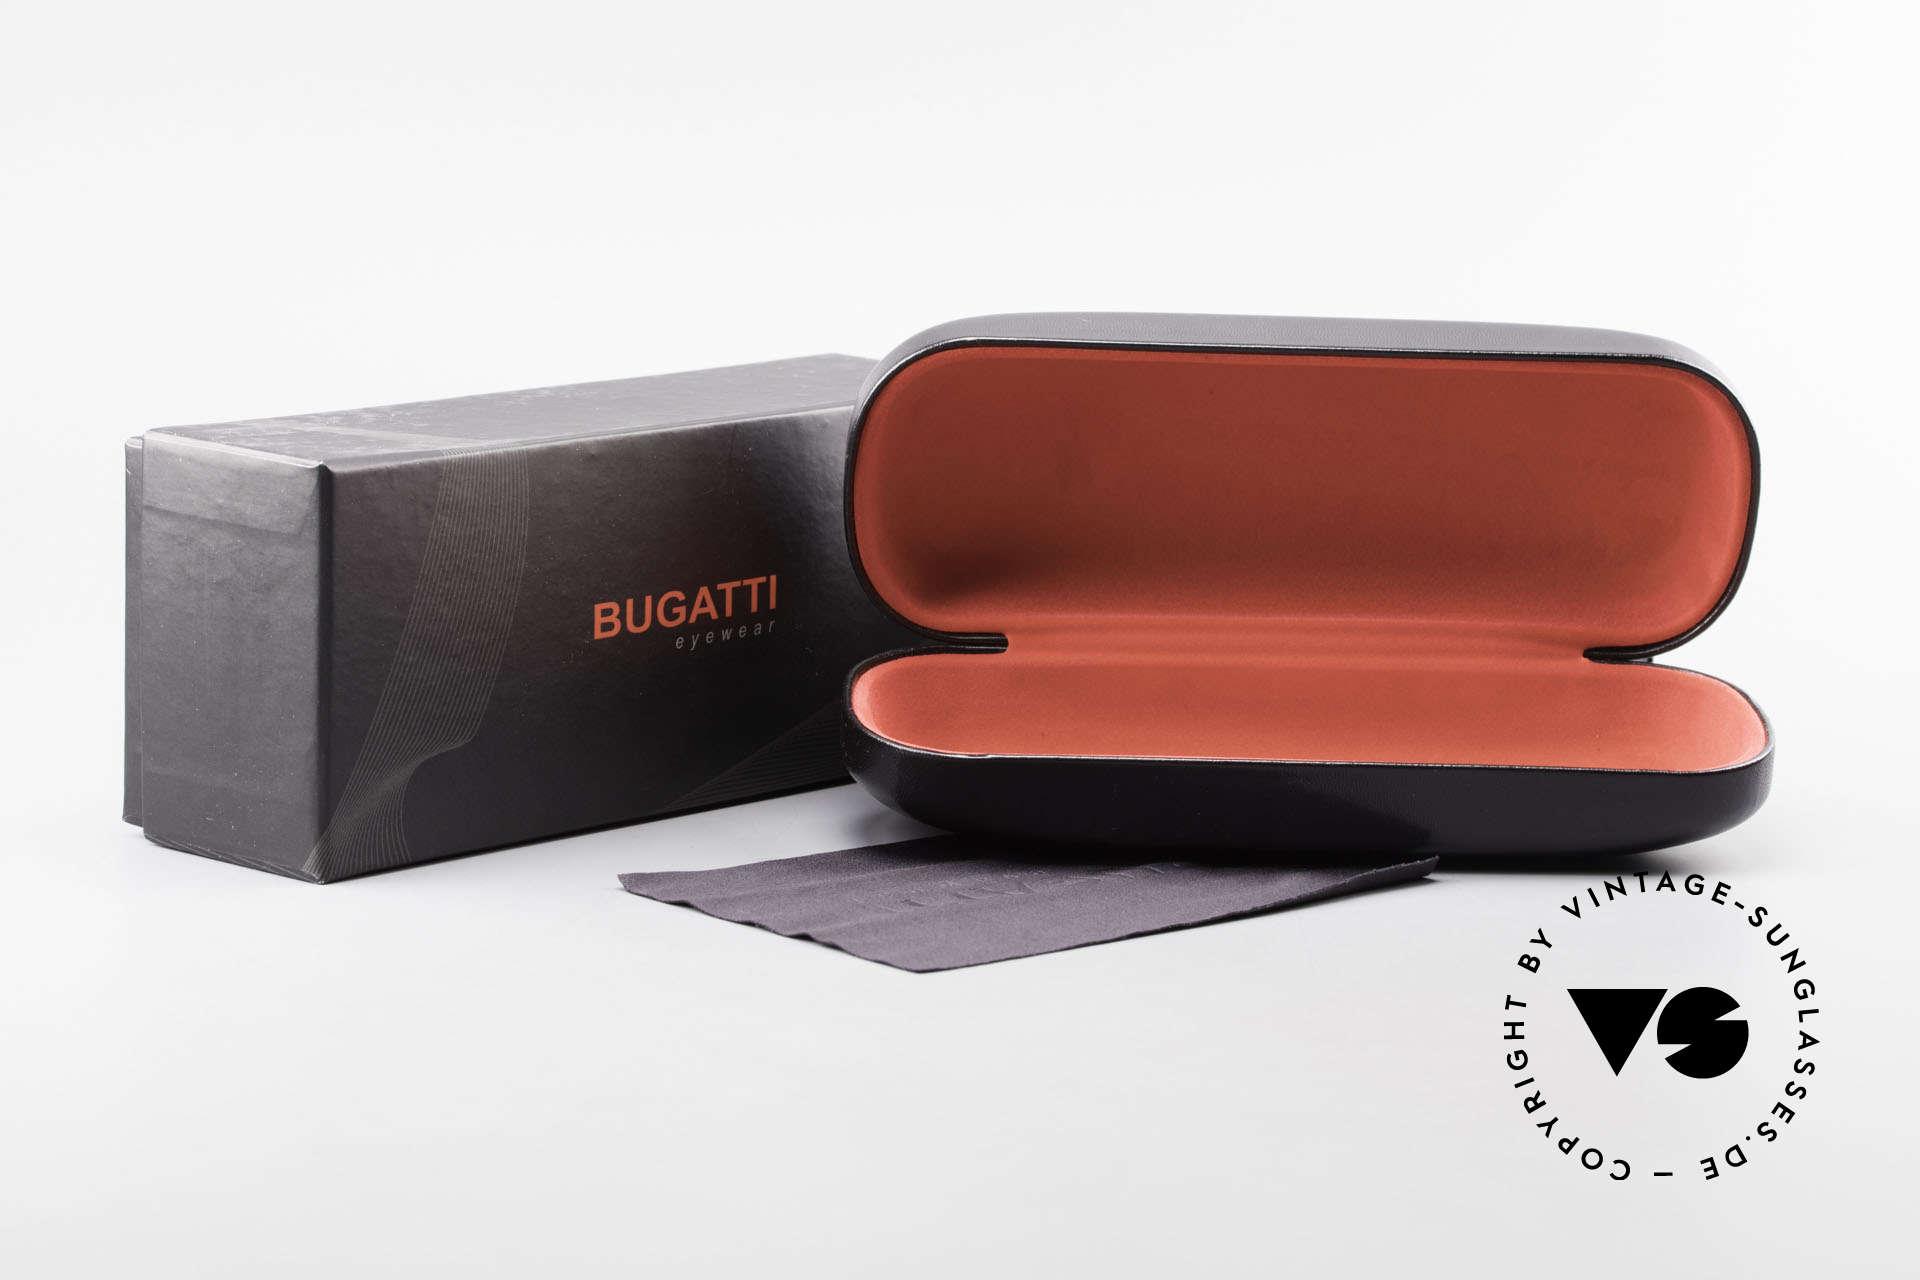 Bugatti 486 Striking Luxury Men's Glasses, Size: medium, Made for Men